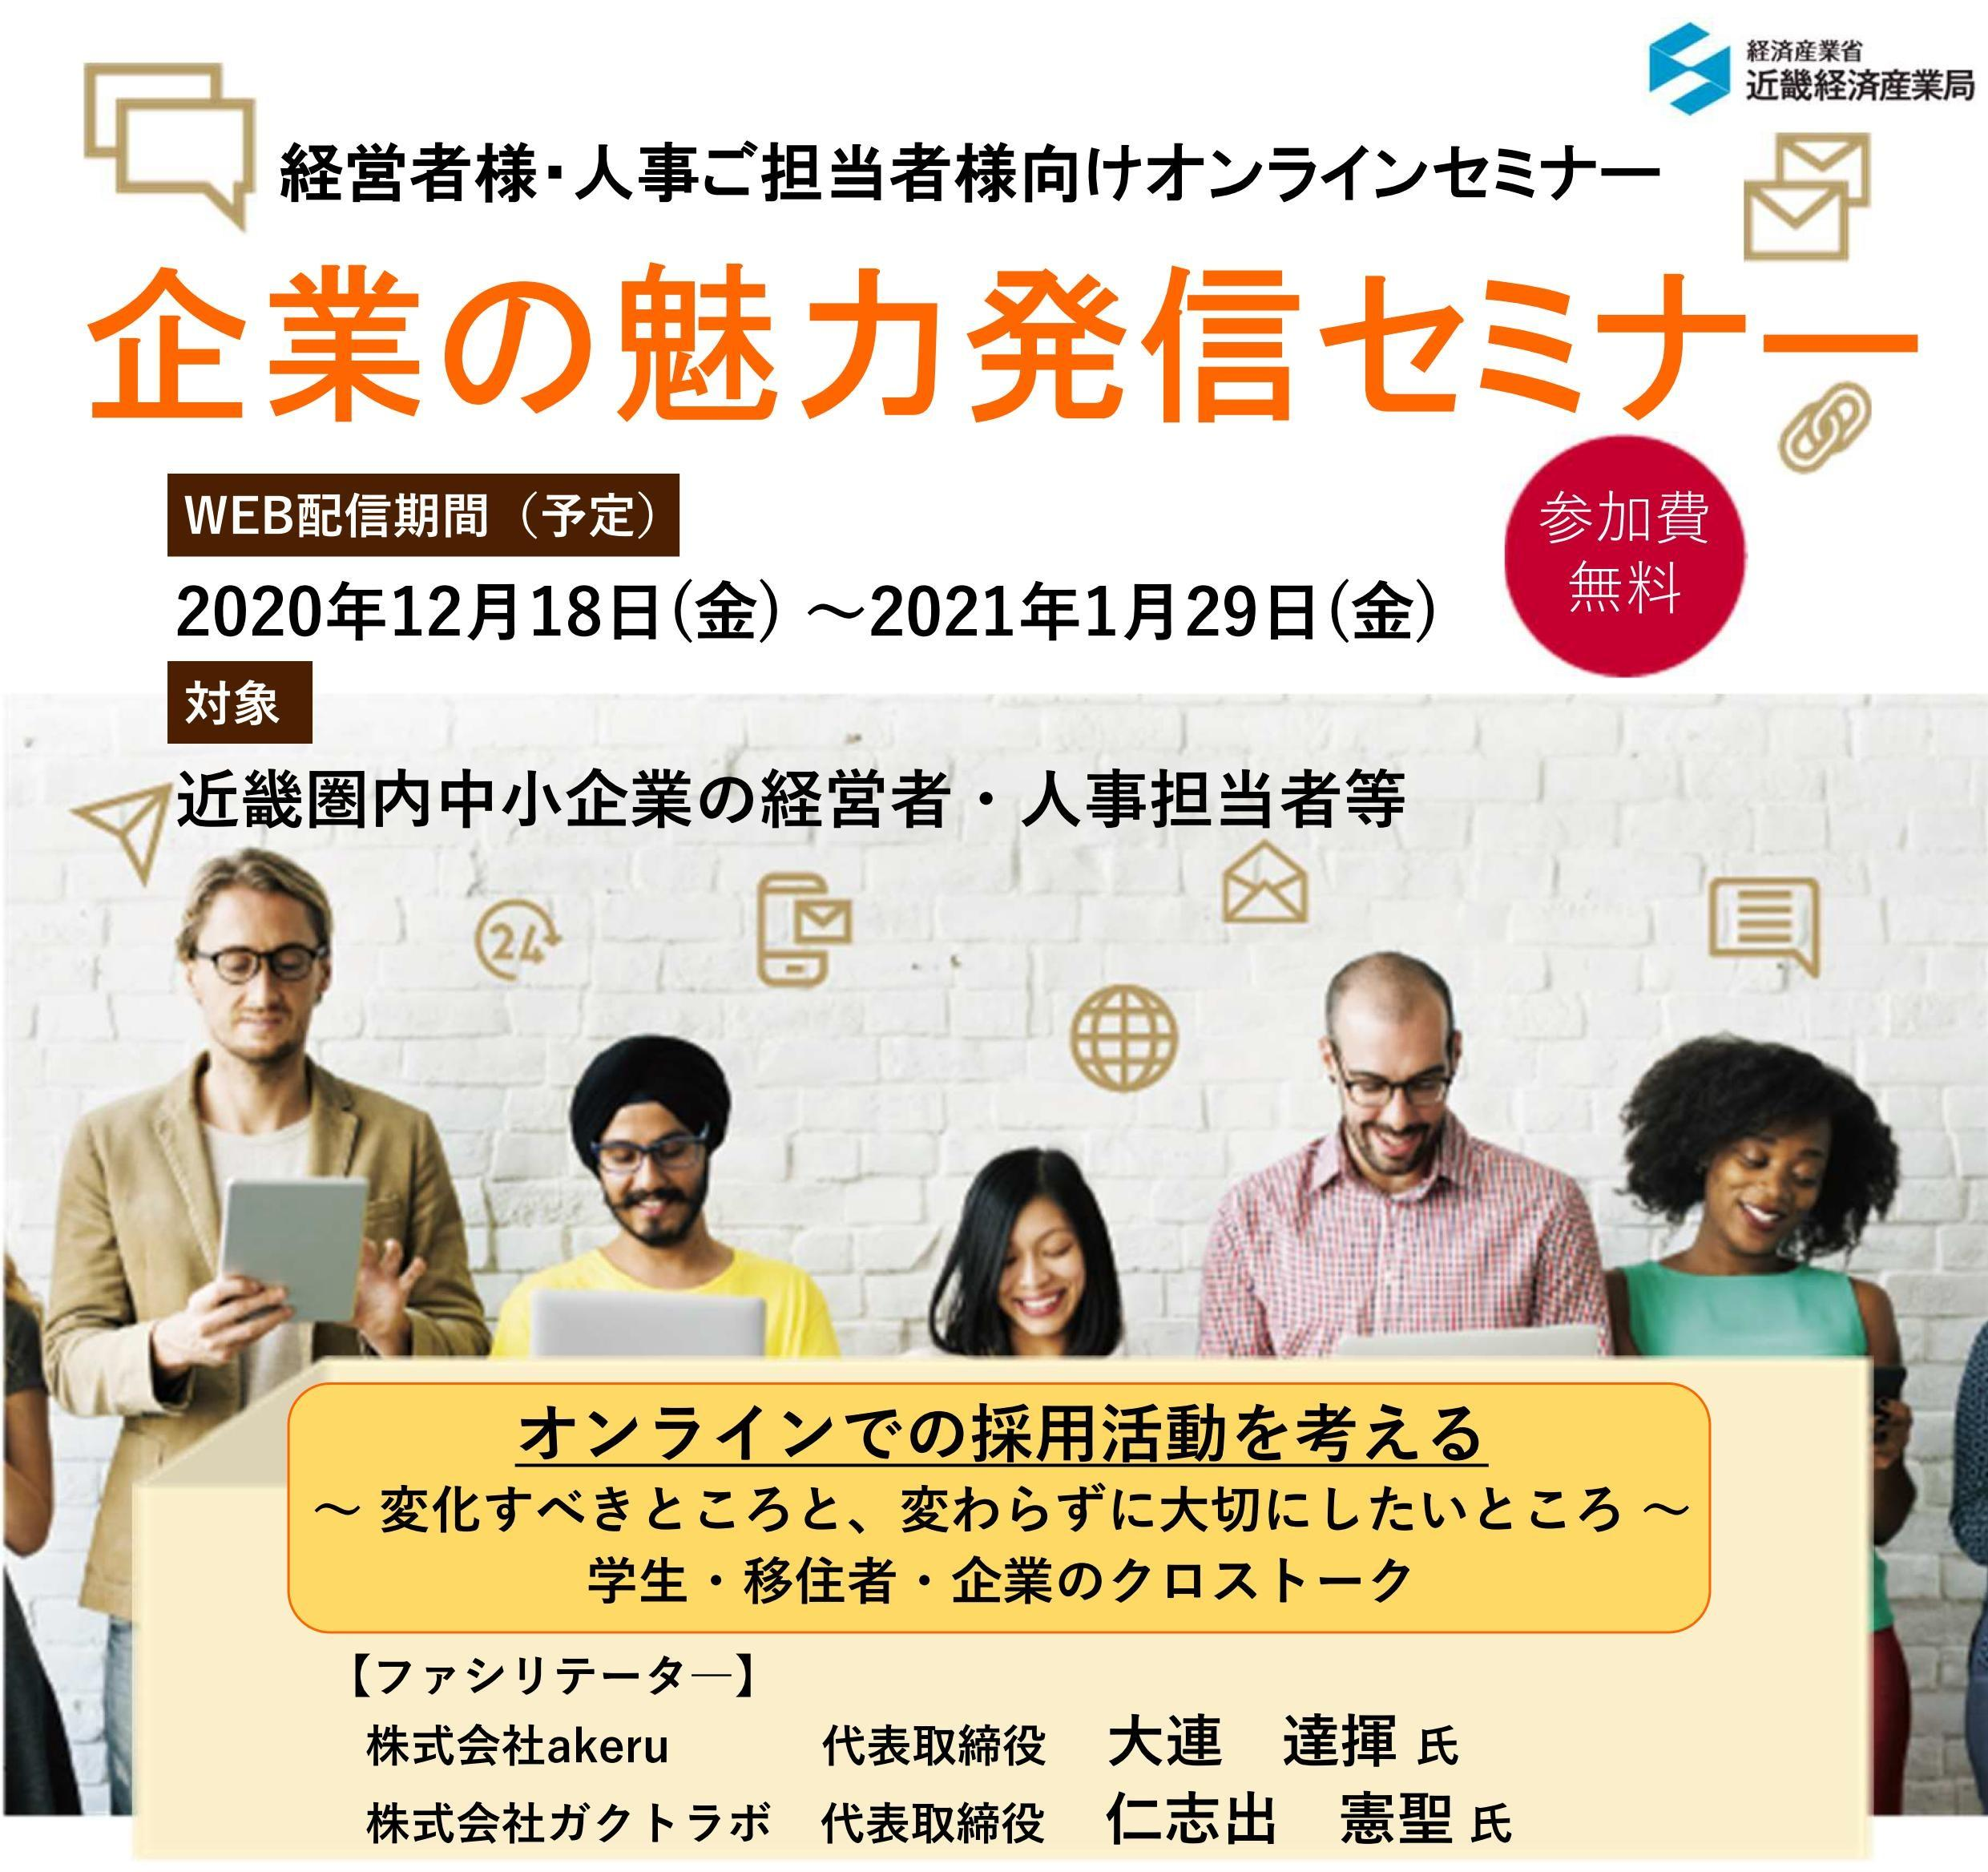 20201218fukui-miryokuhassin-topimg.jpg